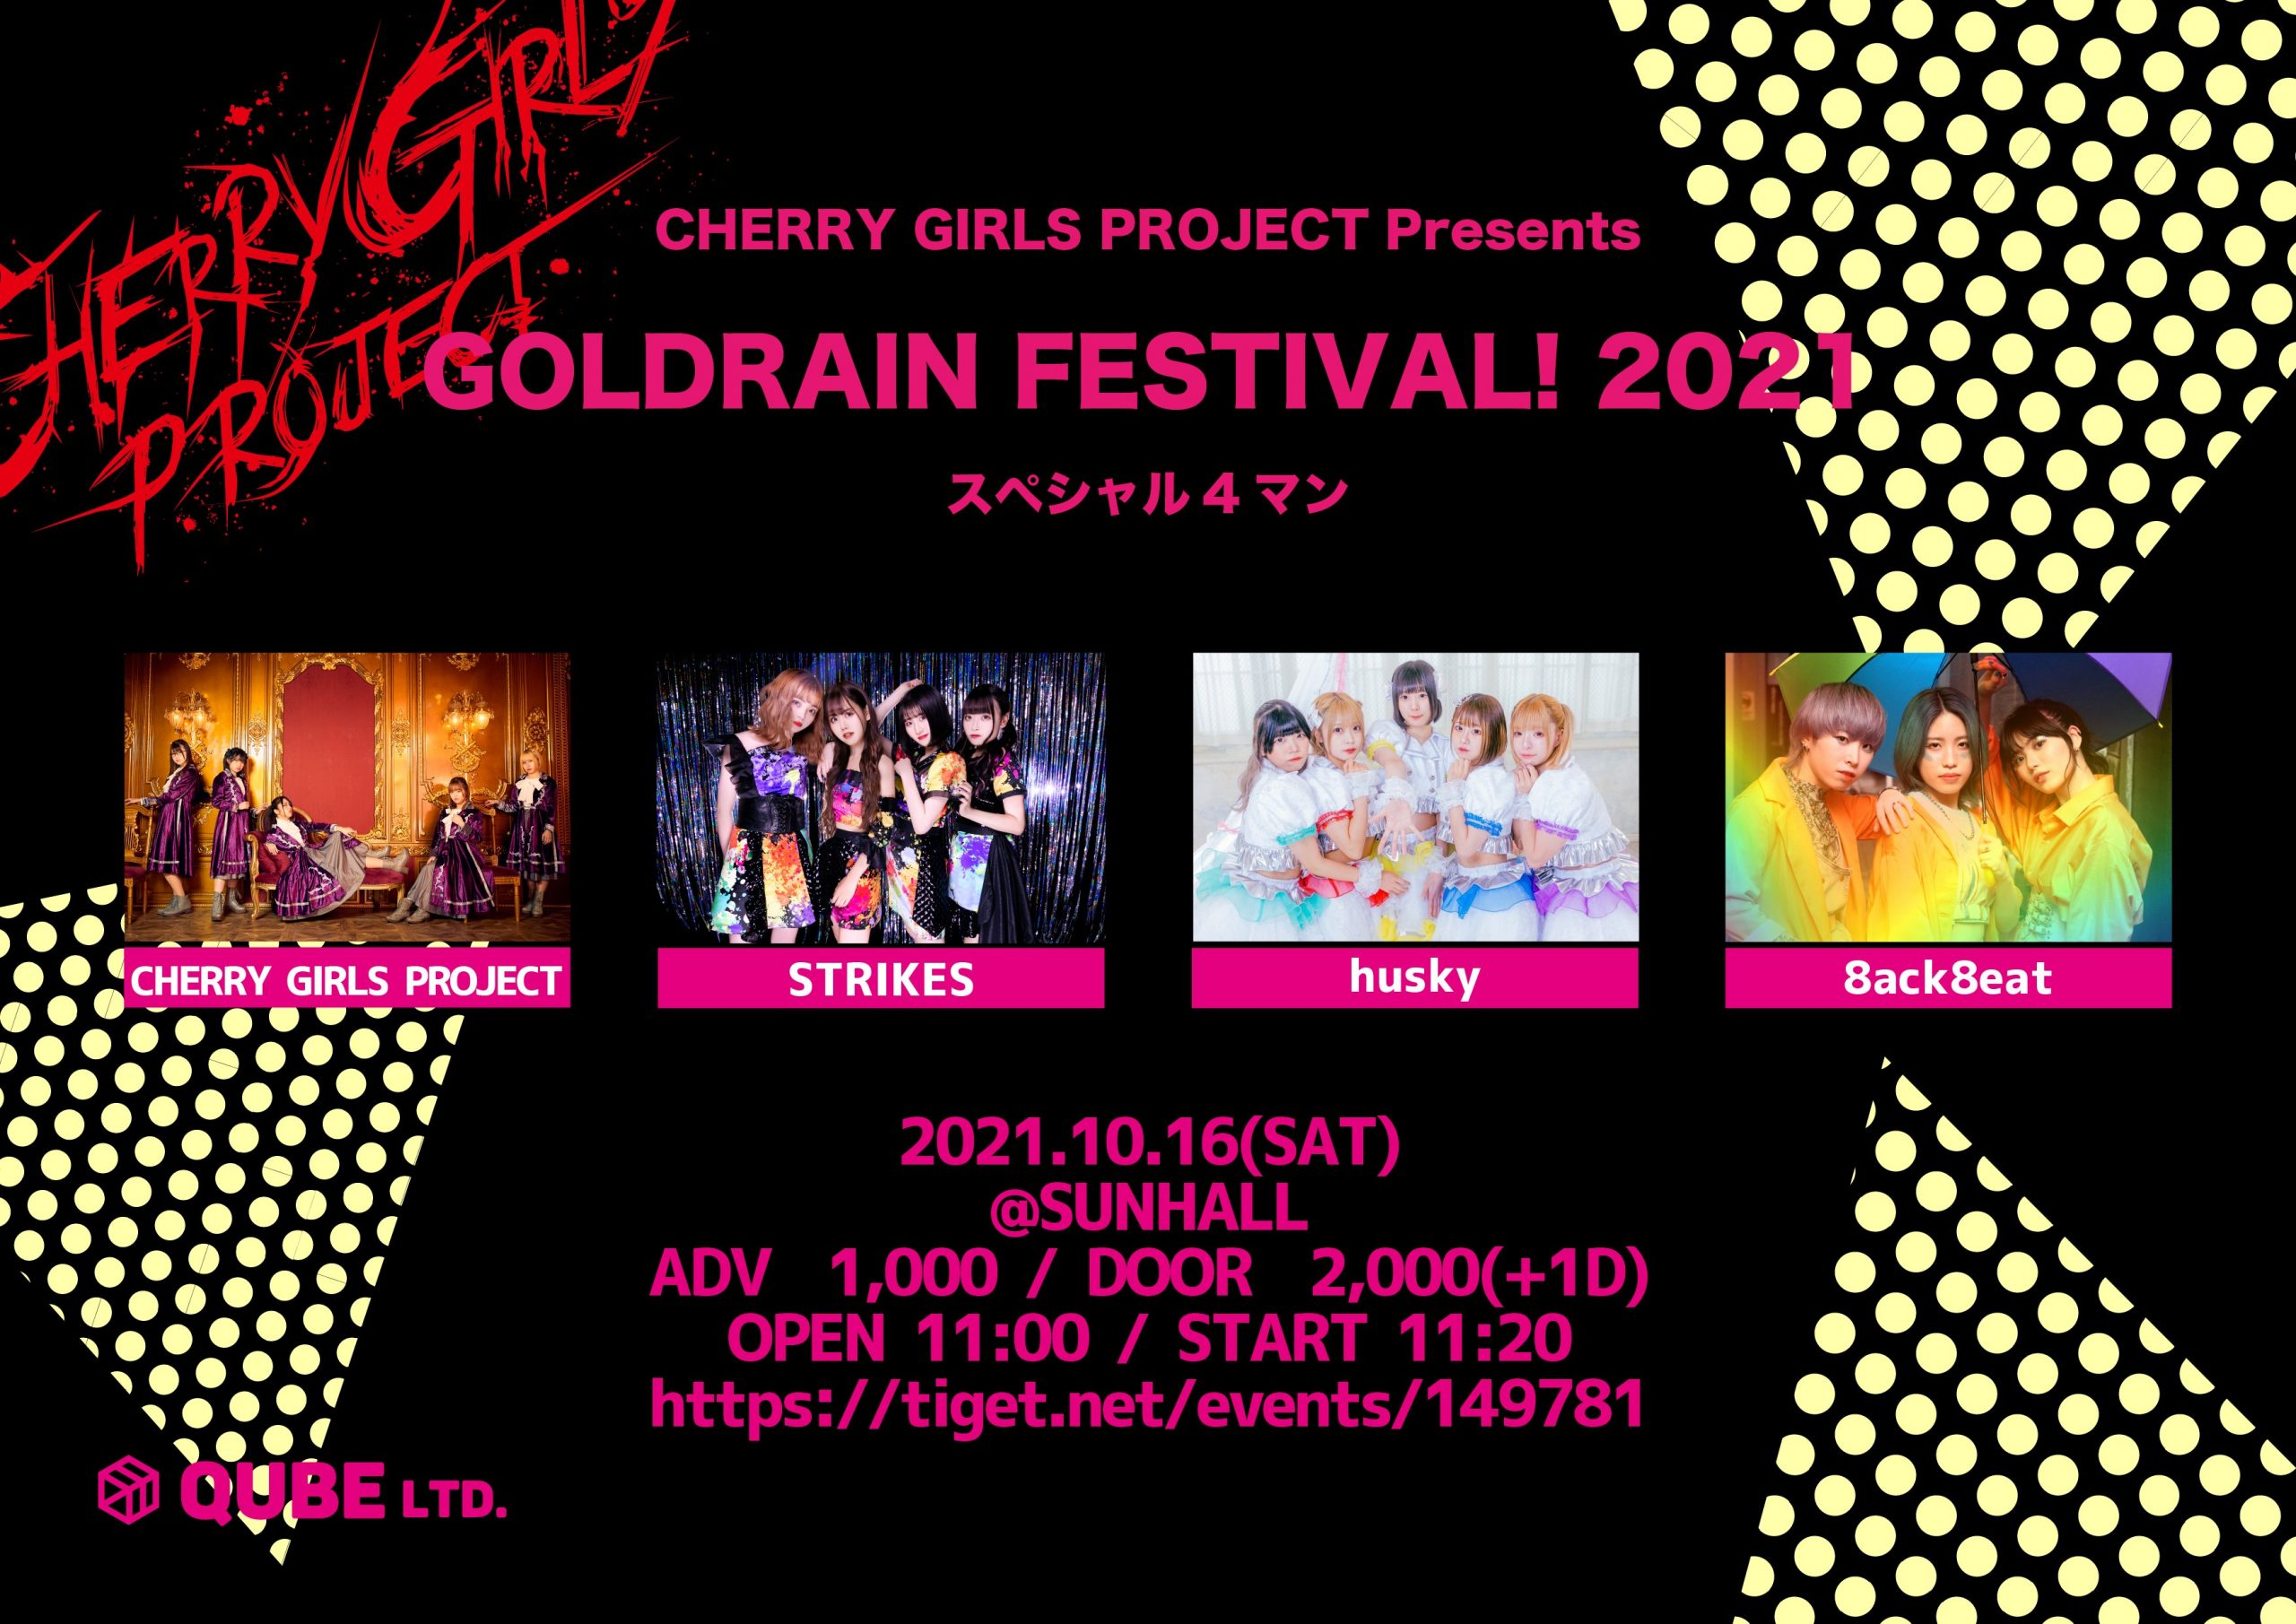 GOLDRAIN FESTIVAL! 2021